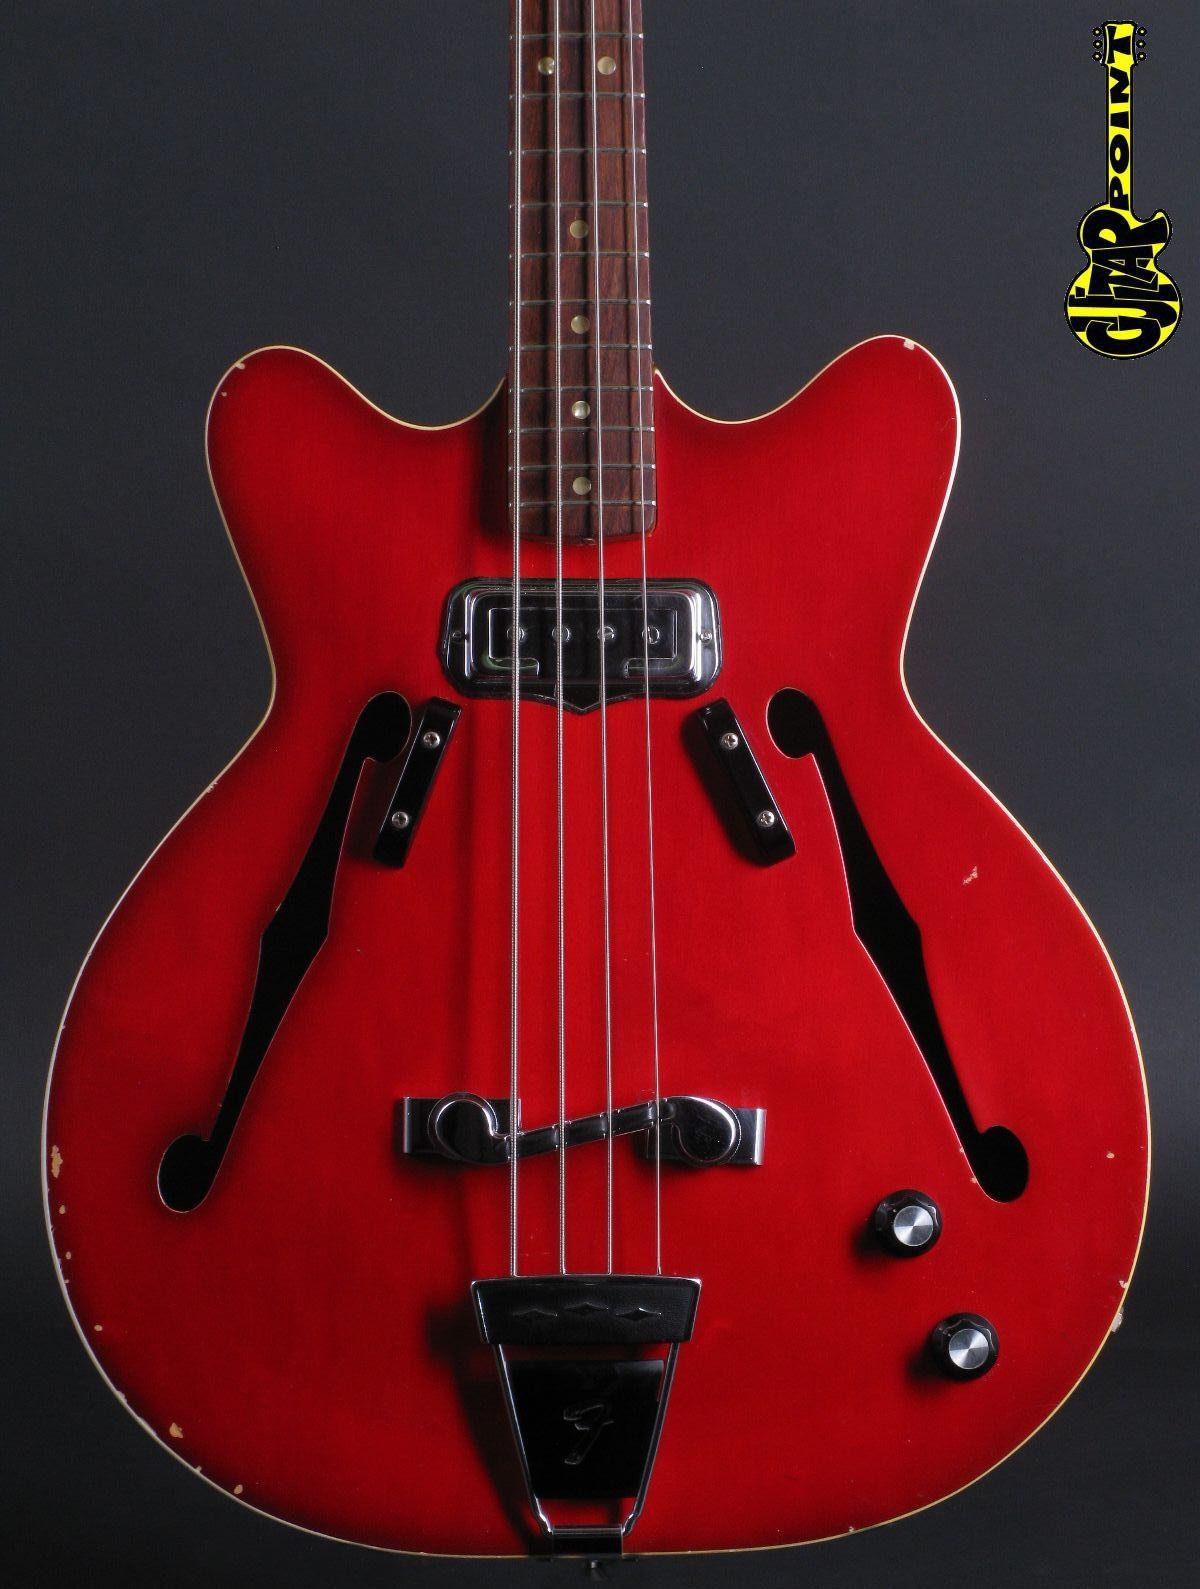 1967 Fender Coronado Bass - Candy Apple Red Burst